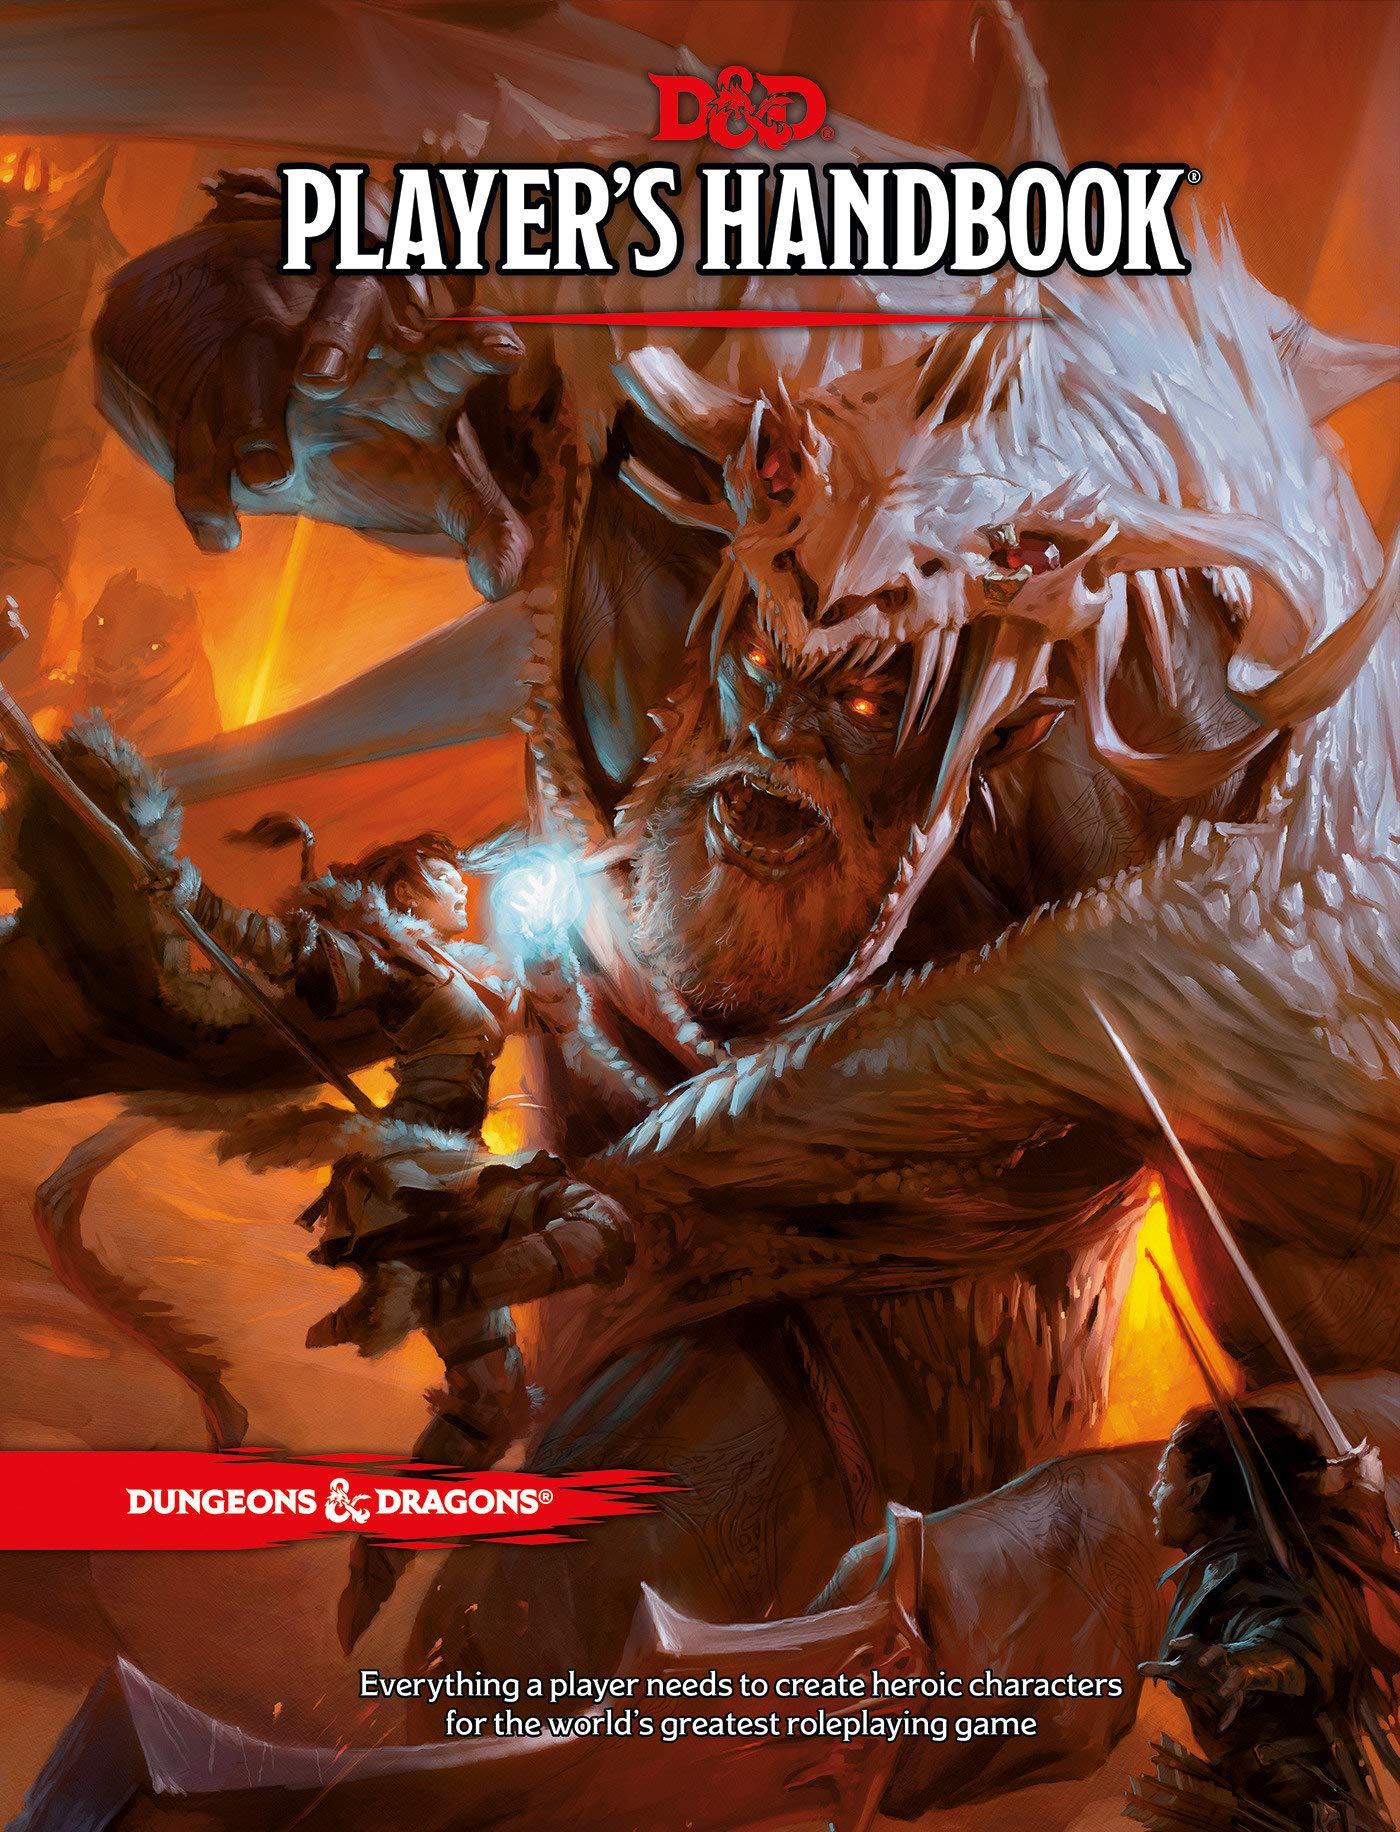 Dungeons & Dragons D&D Player's Handbook cover